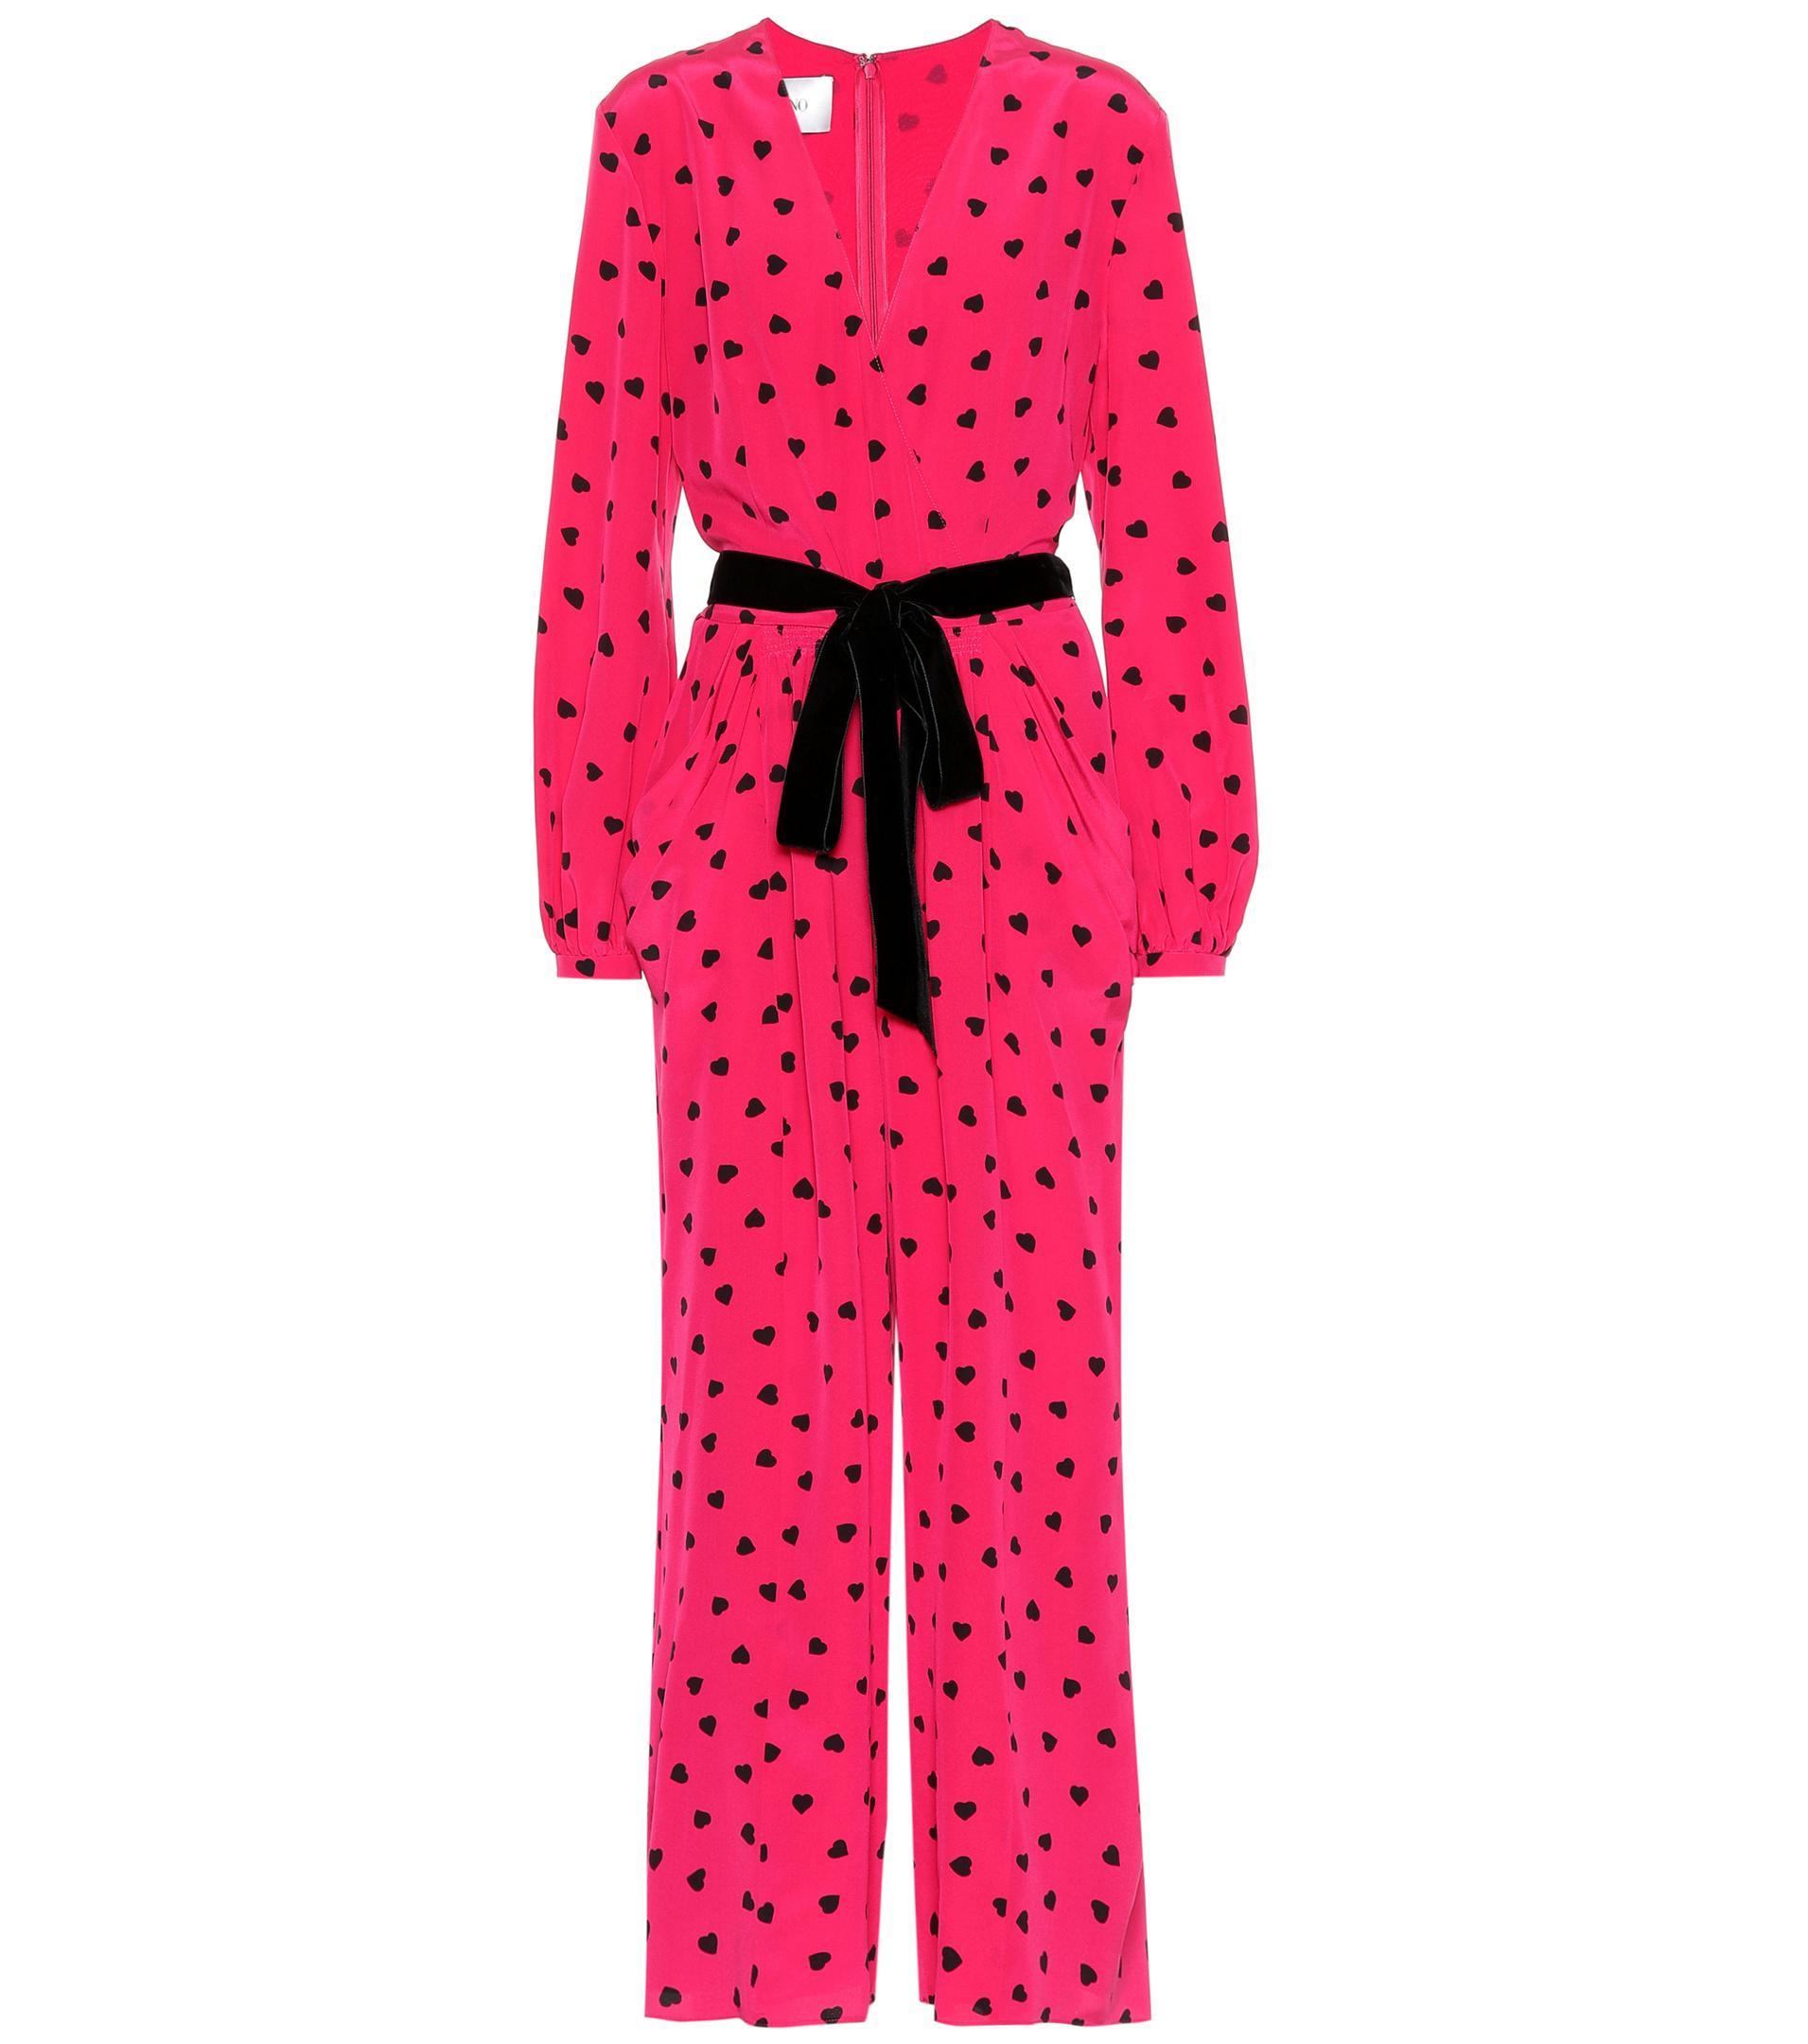 a3b89de2efe Lyst - Valentino Heart Print Silk Jumpsuit in Pink - Save 62%